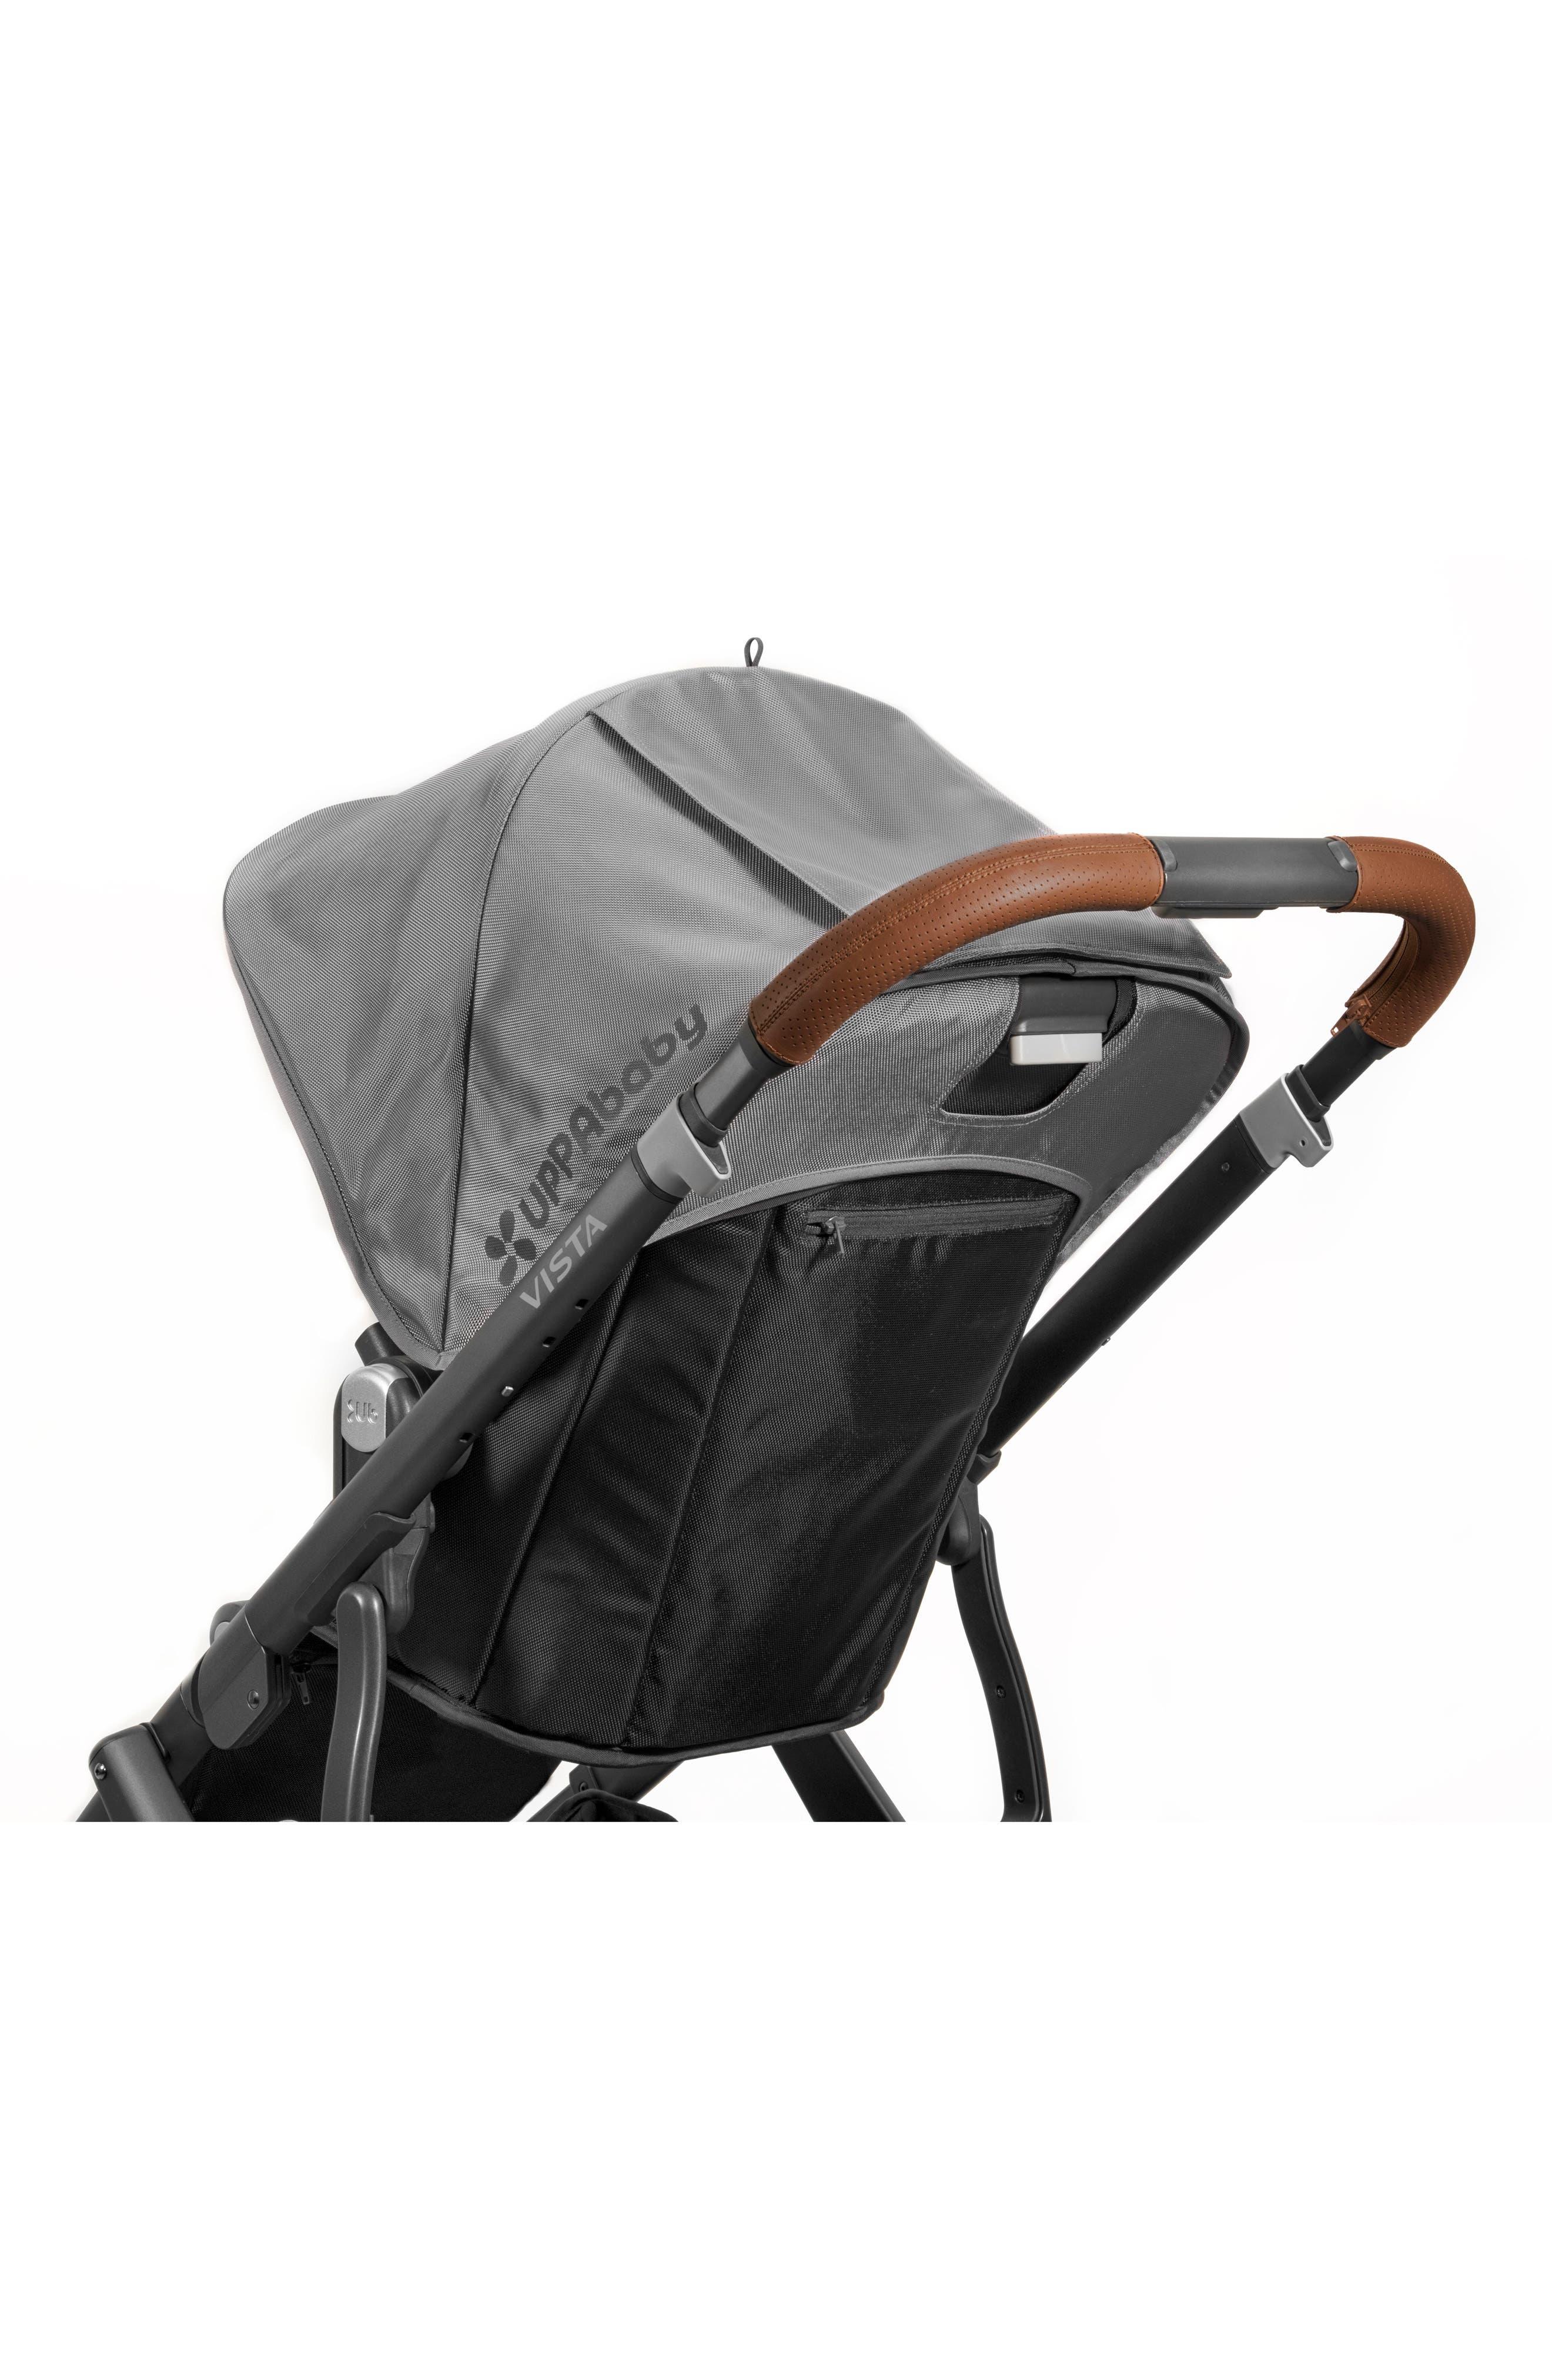 UPPAbaby VISTA® Stroller Handlebar Cover